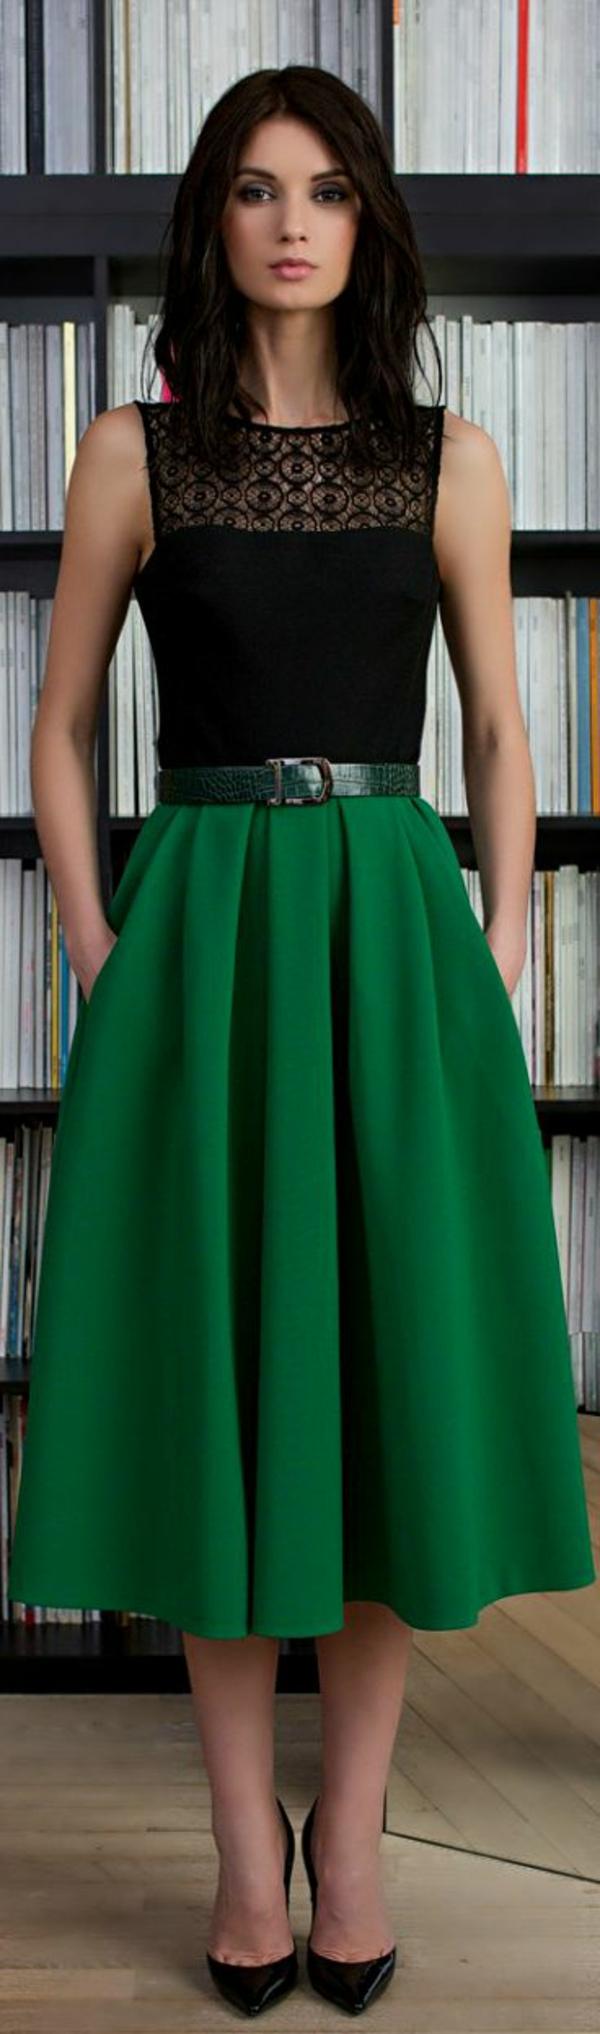 jupe-longue-midi-verte-femme-moderne-bibliothèque-mode